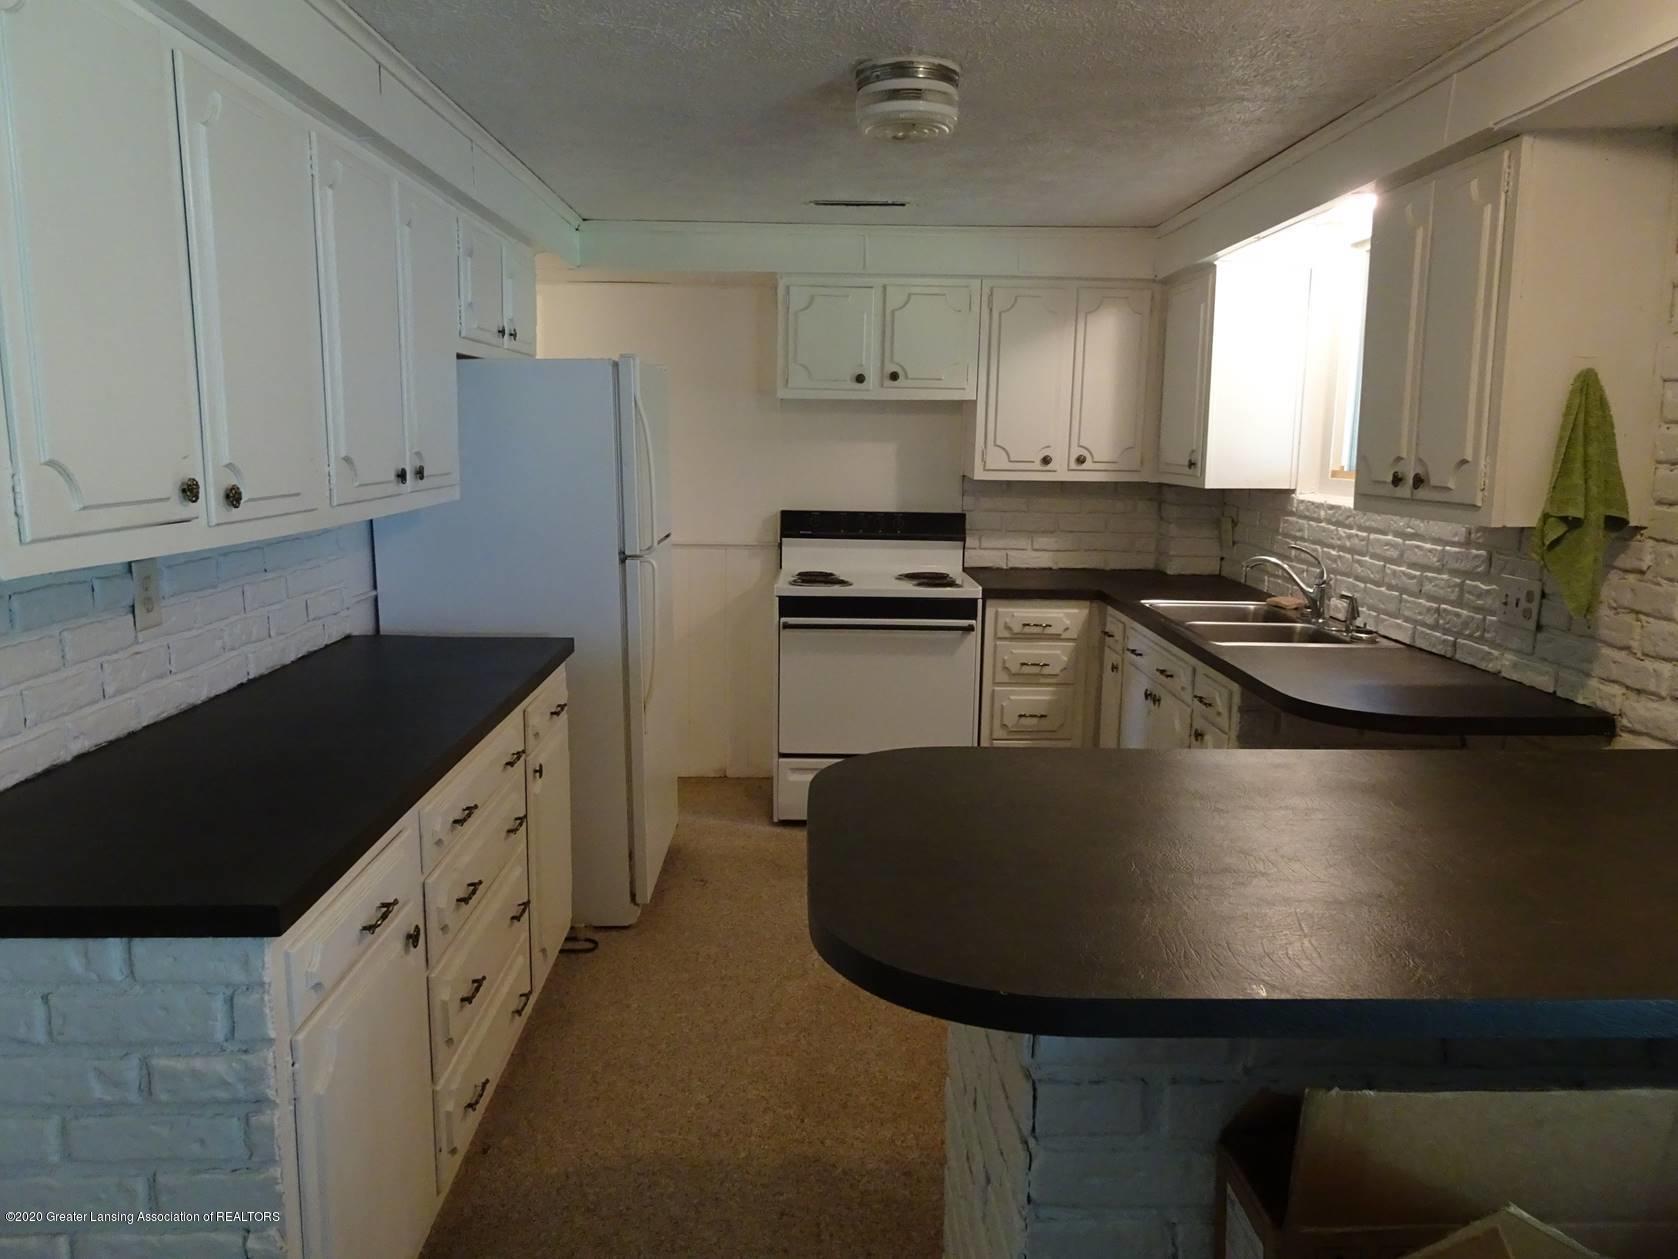 5354 N Michigan Rd - Kitchen - 7